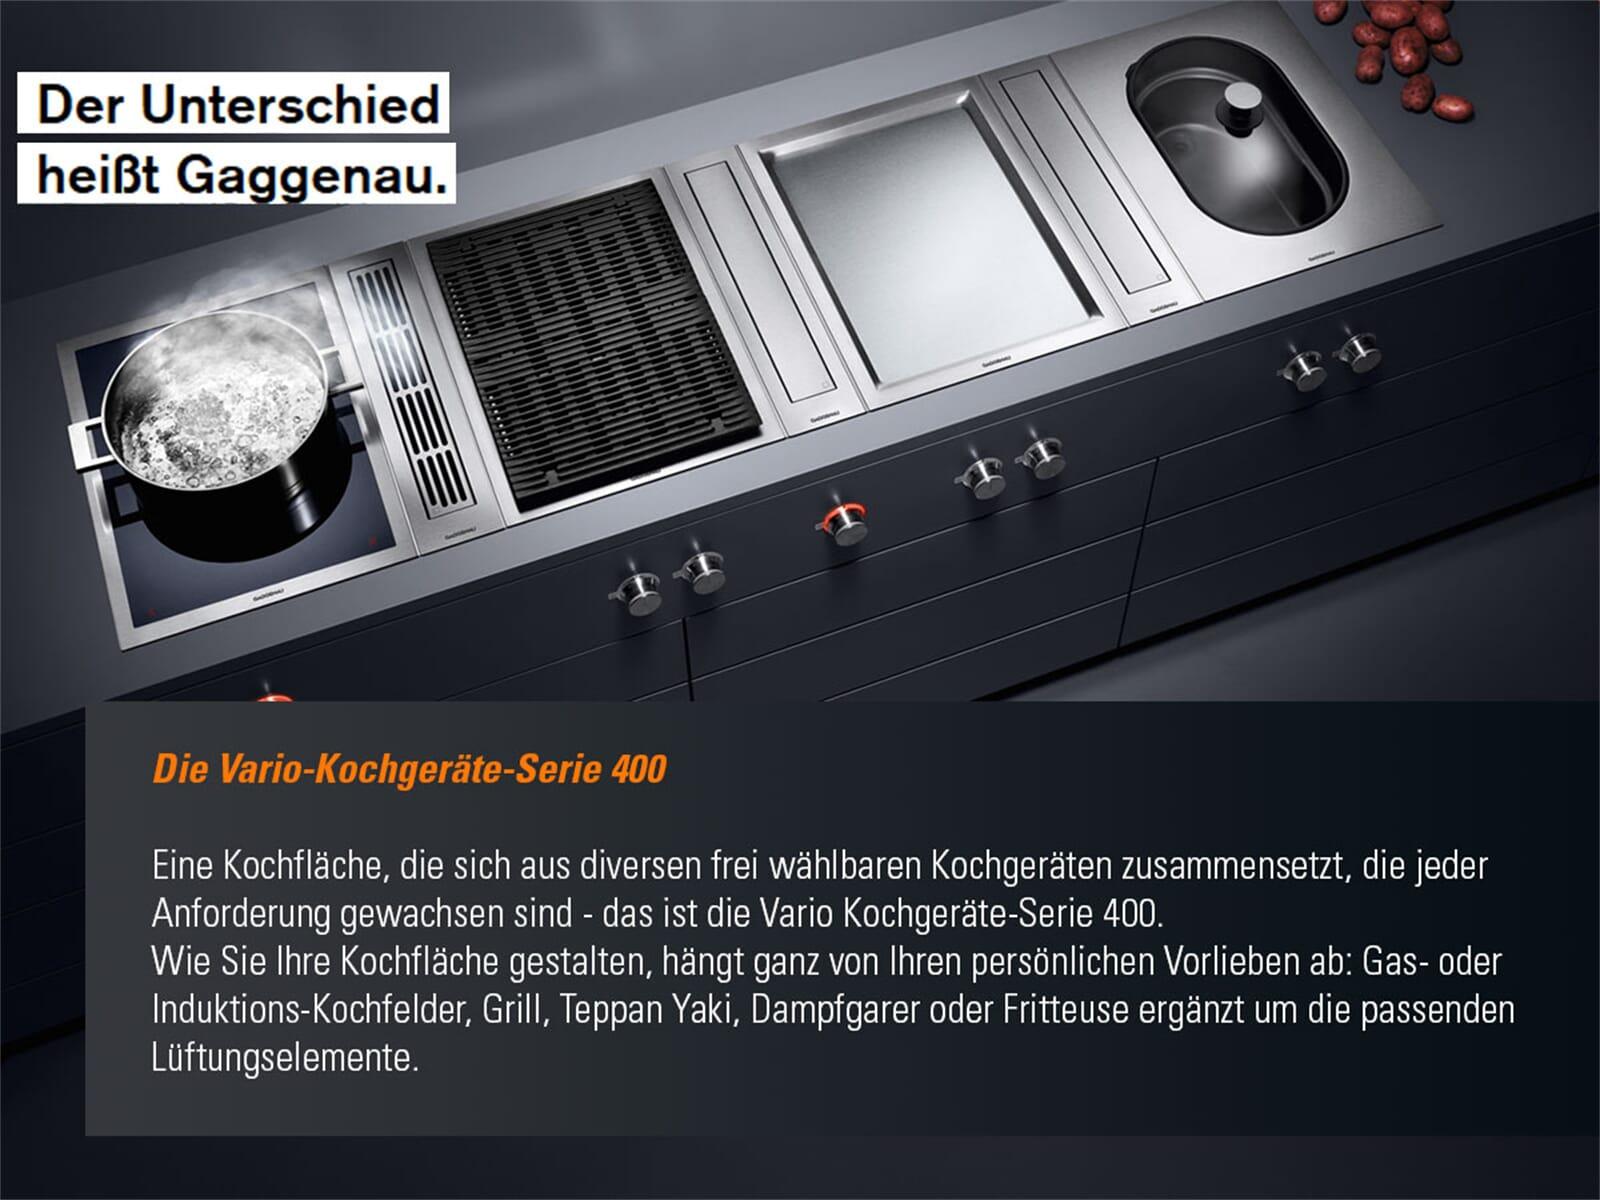 gaggenau vr 414 110 serie 400 domino elektro grill edelstahl. Black Bedroom Furniture Sets. Home Design Ideas